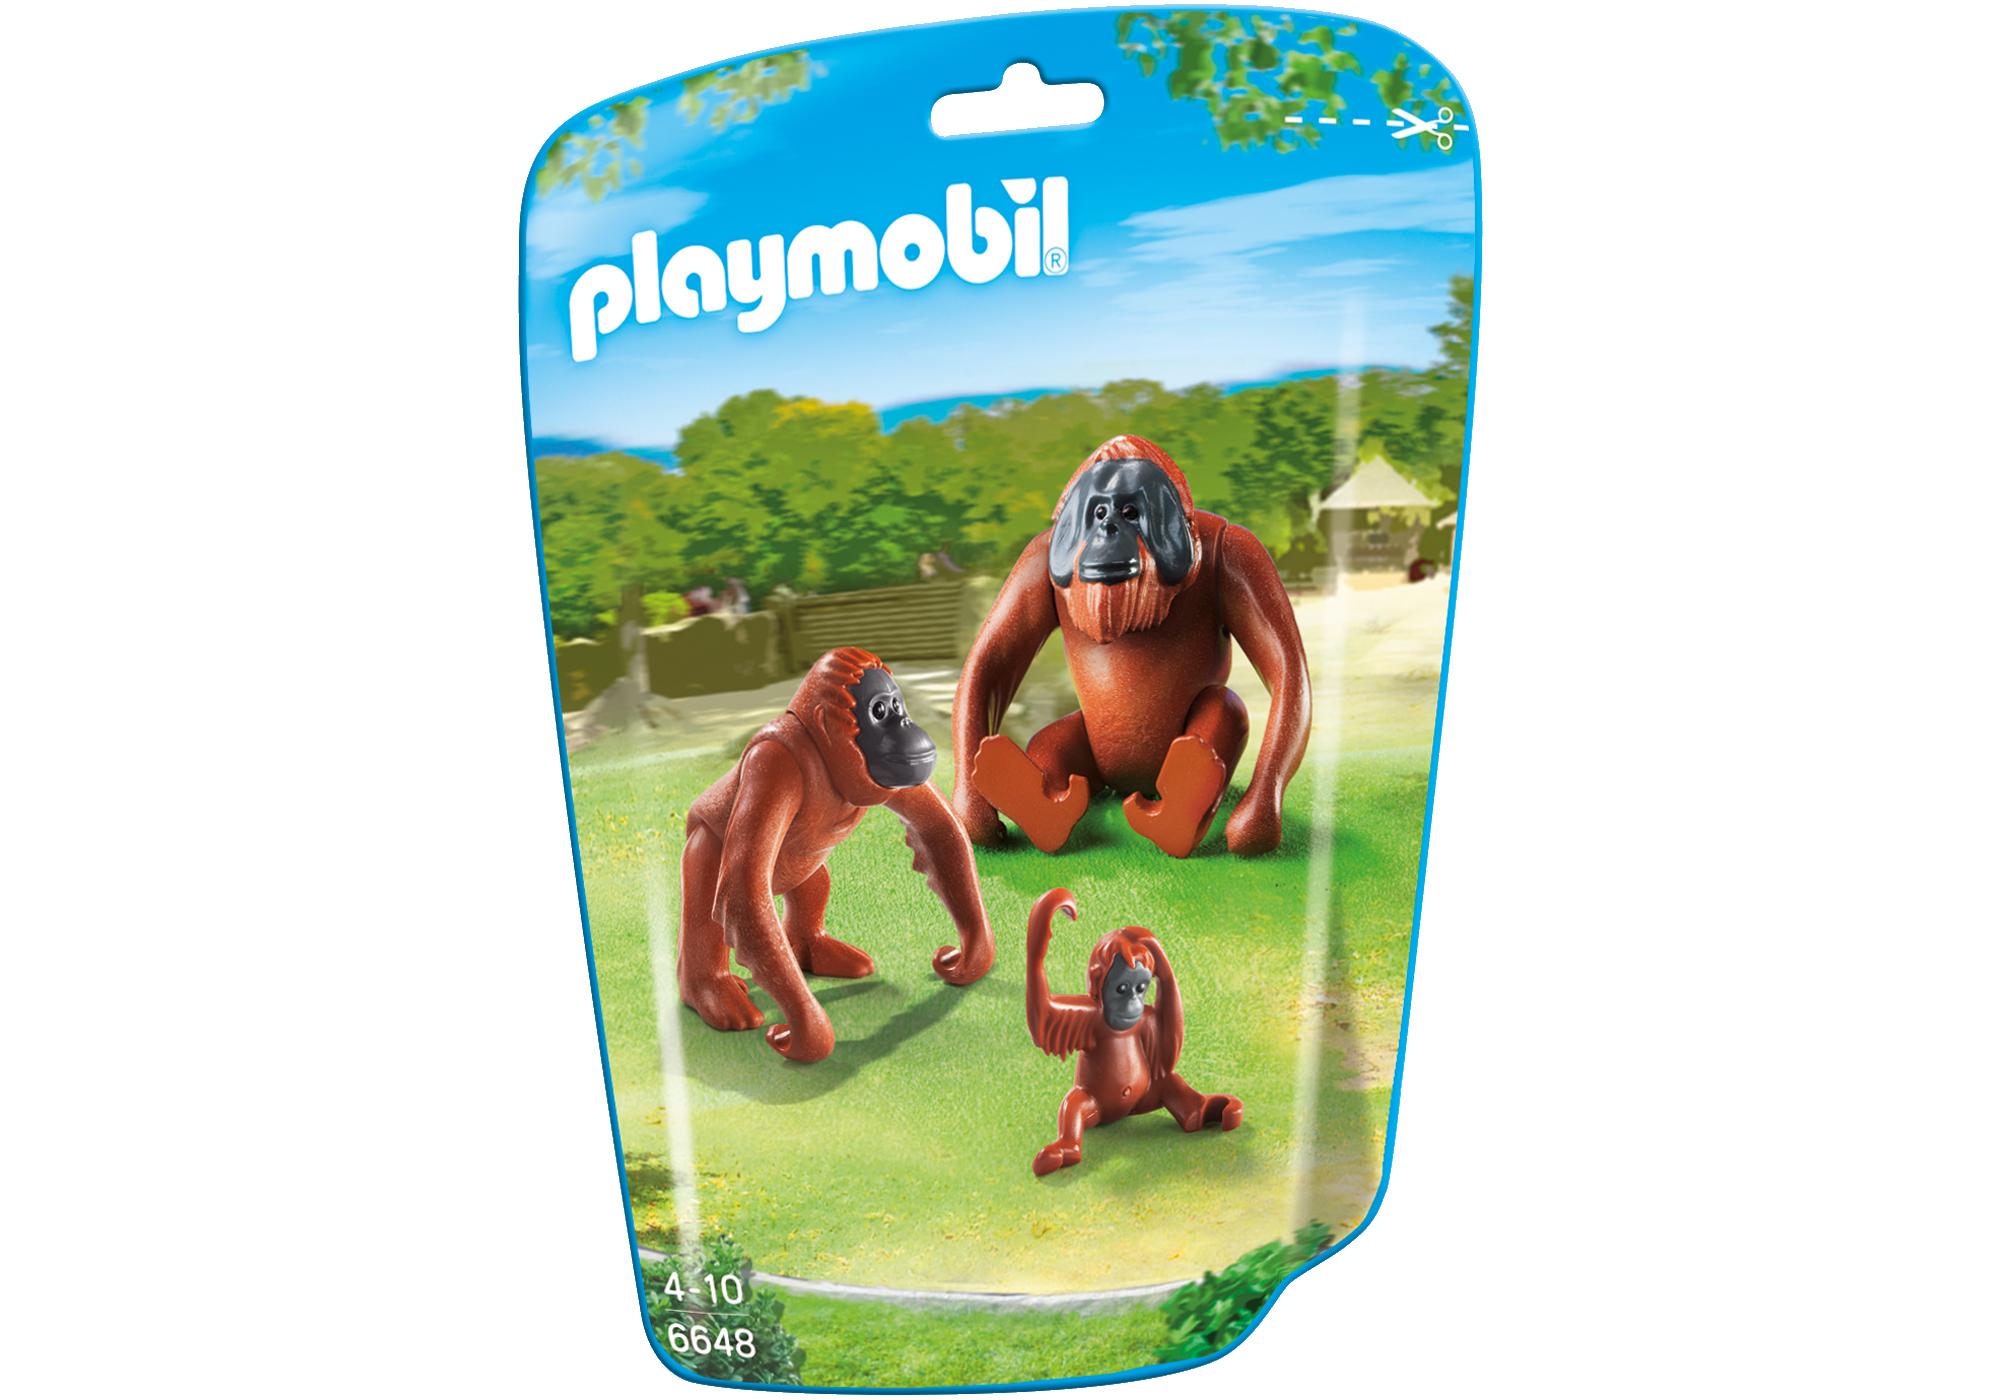 http://media.playmobil.com/i/playmobil/6648_product_box_front